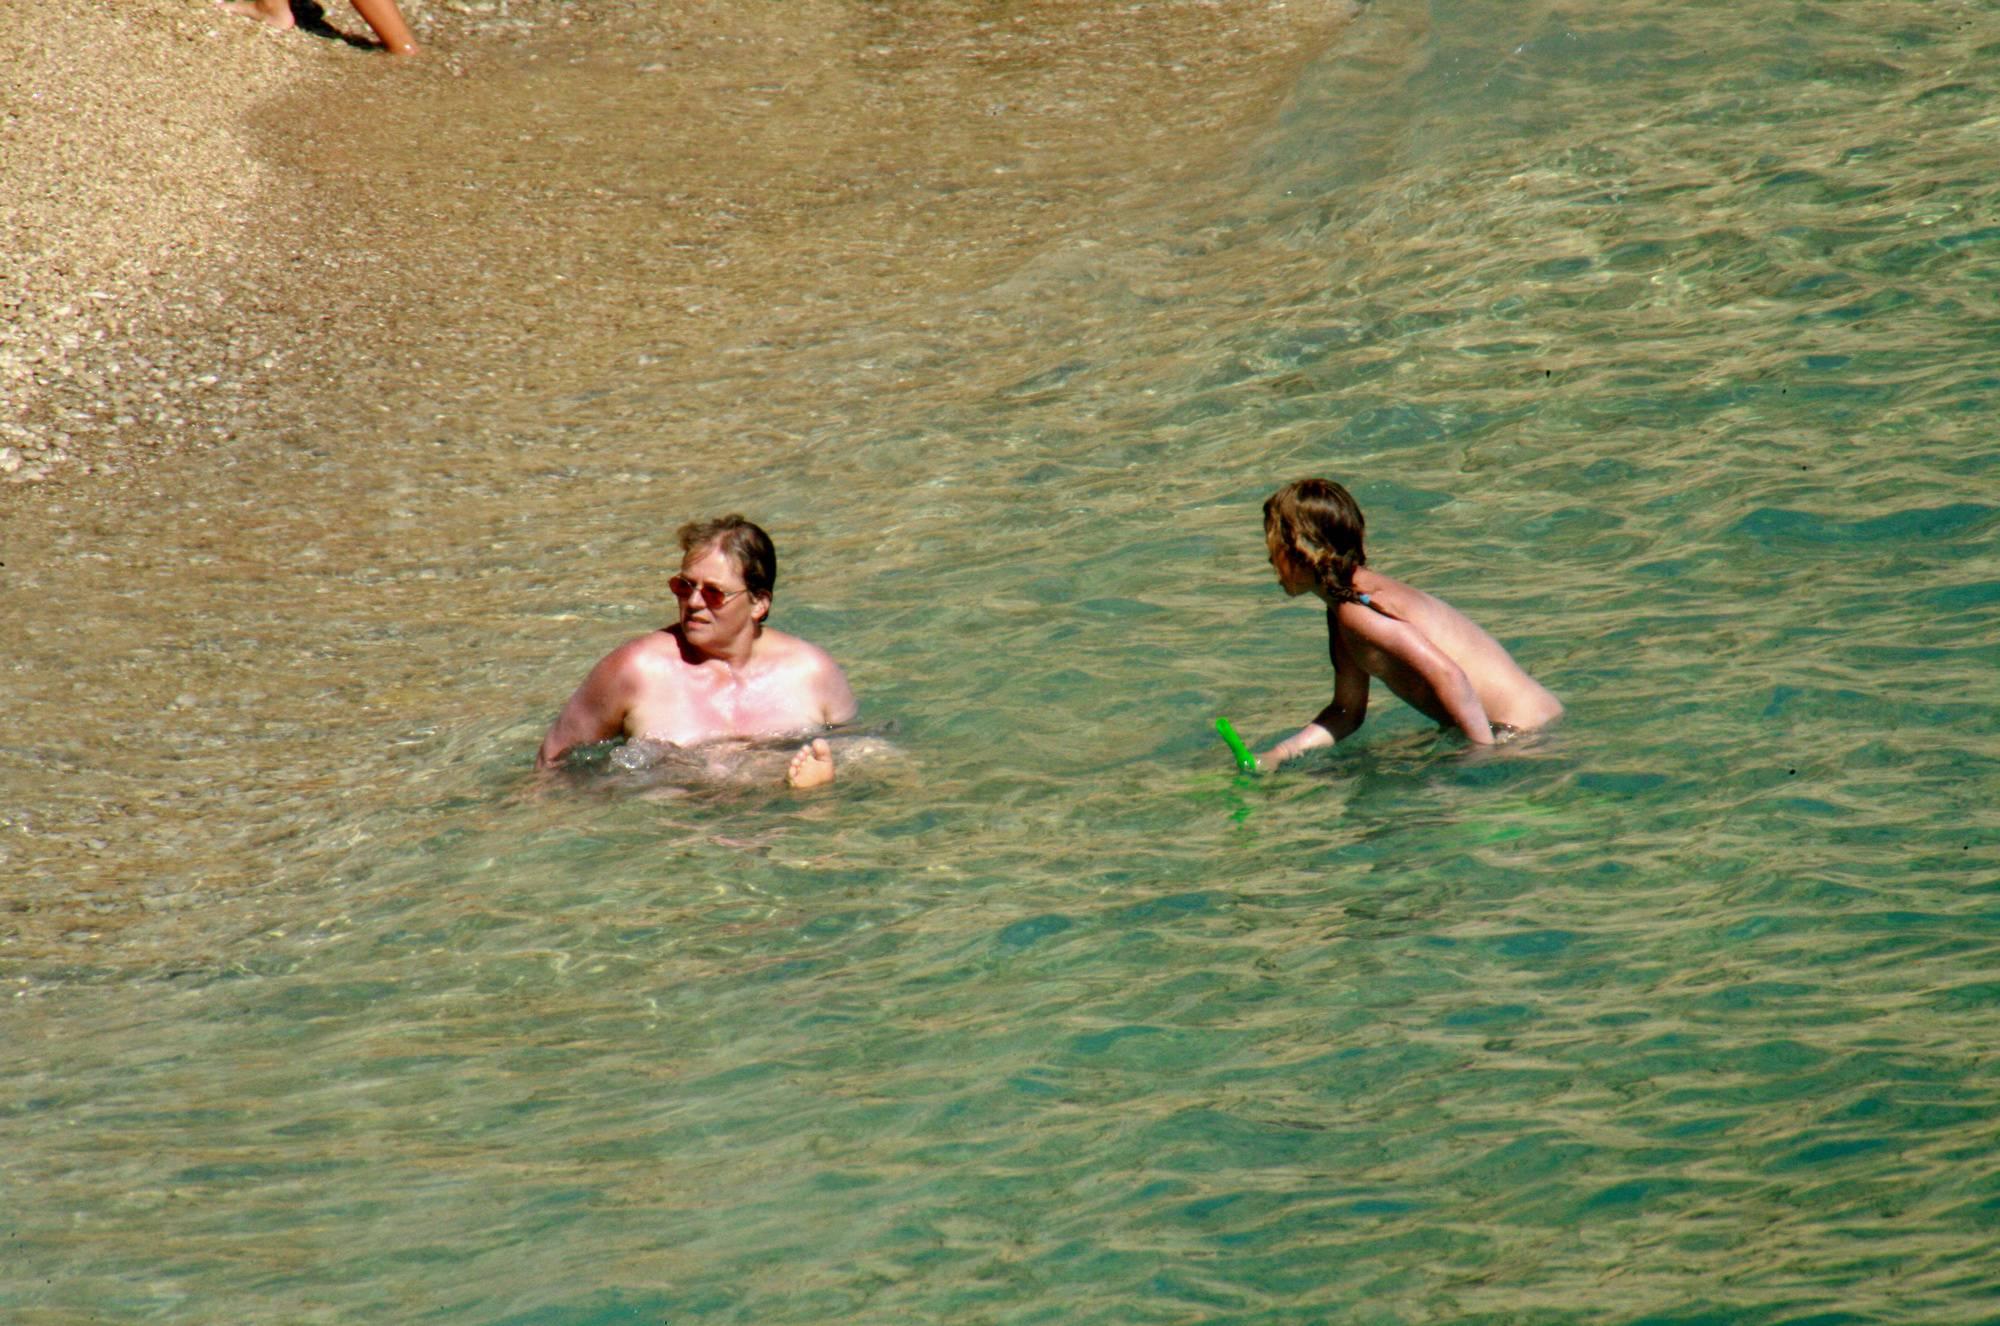 Purenudism Parental Beach Kids Guide - 2